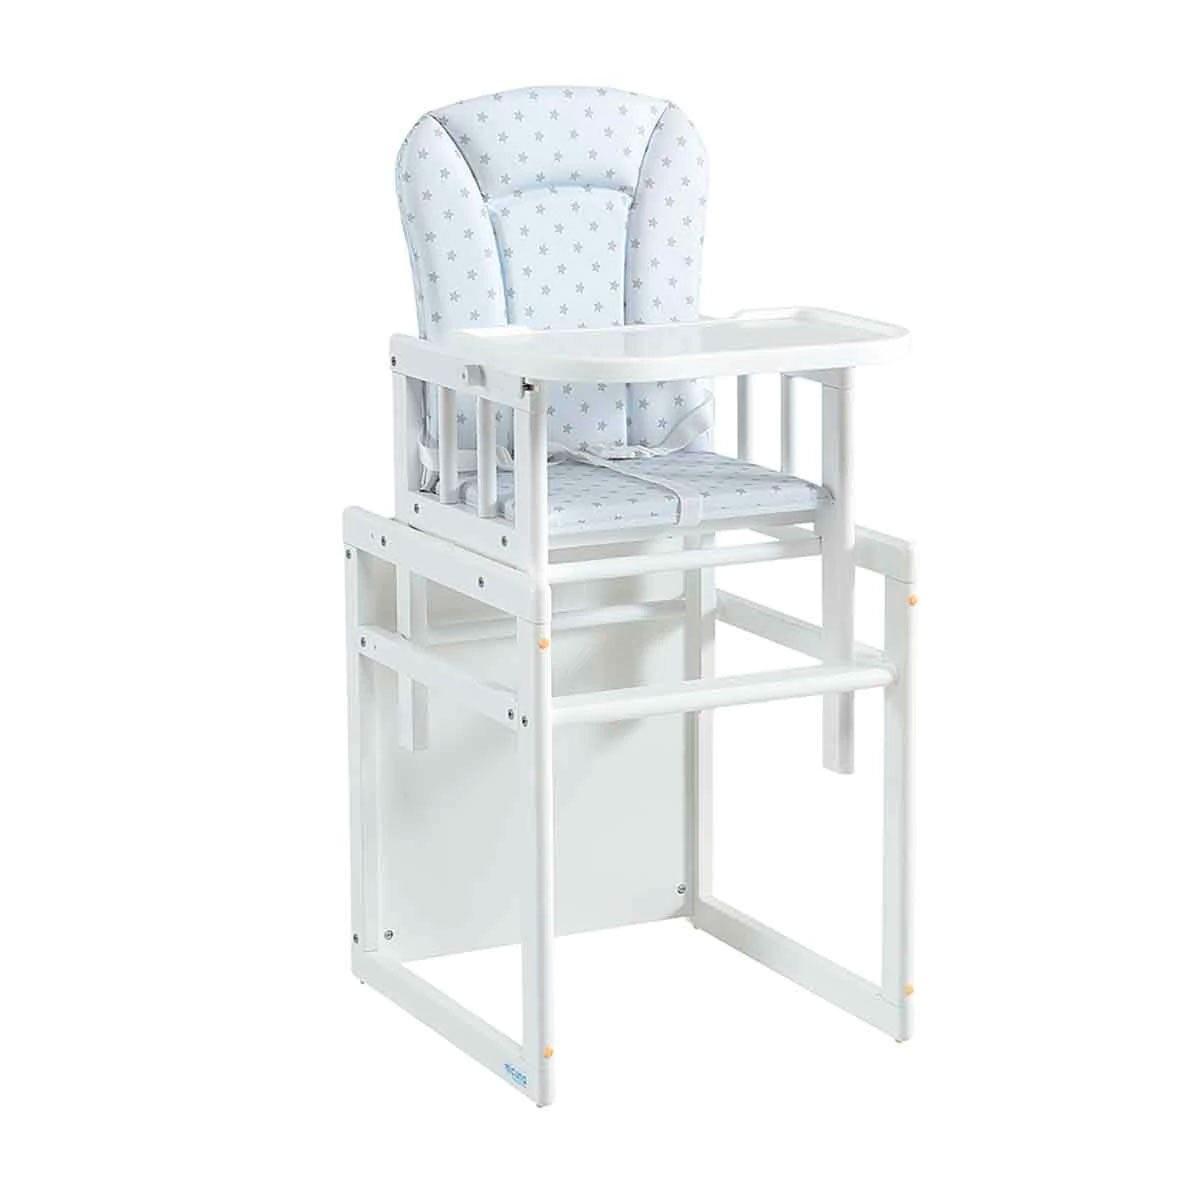 Trona convertible en mesa y silla con tapizado de Micuna